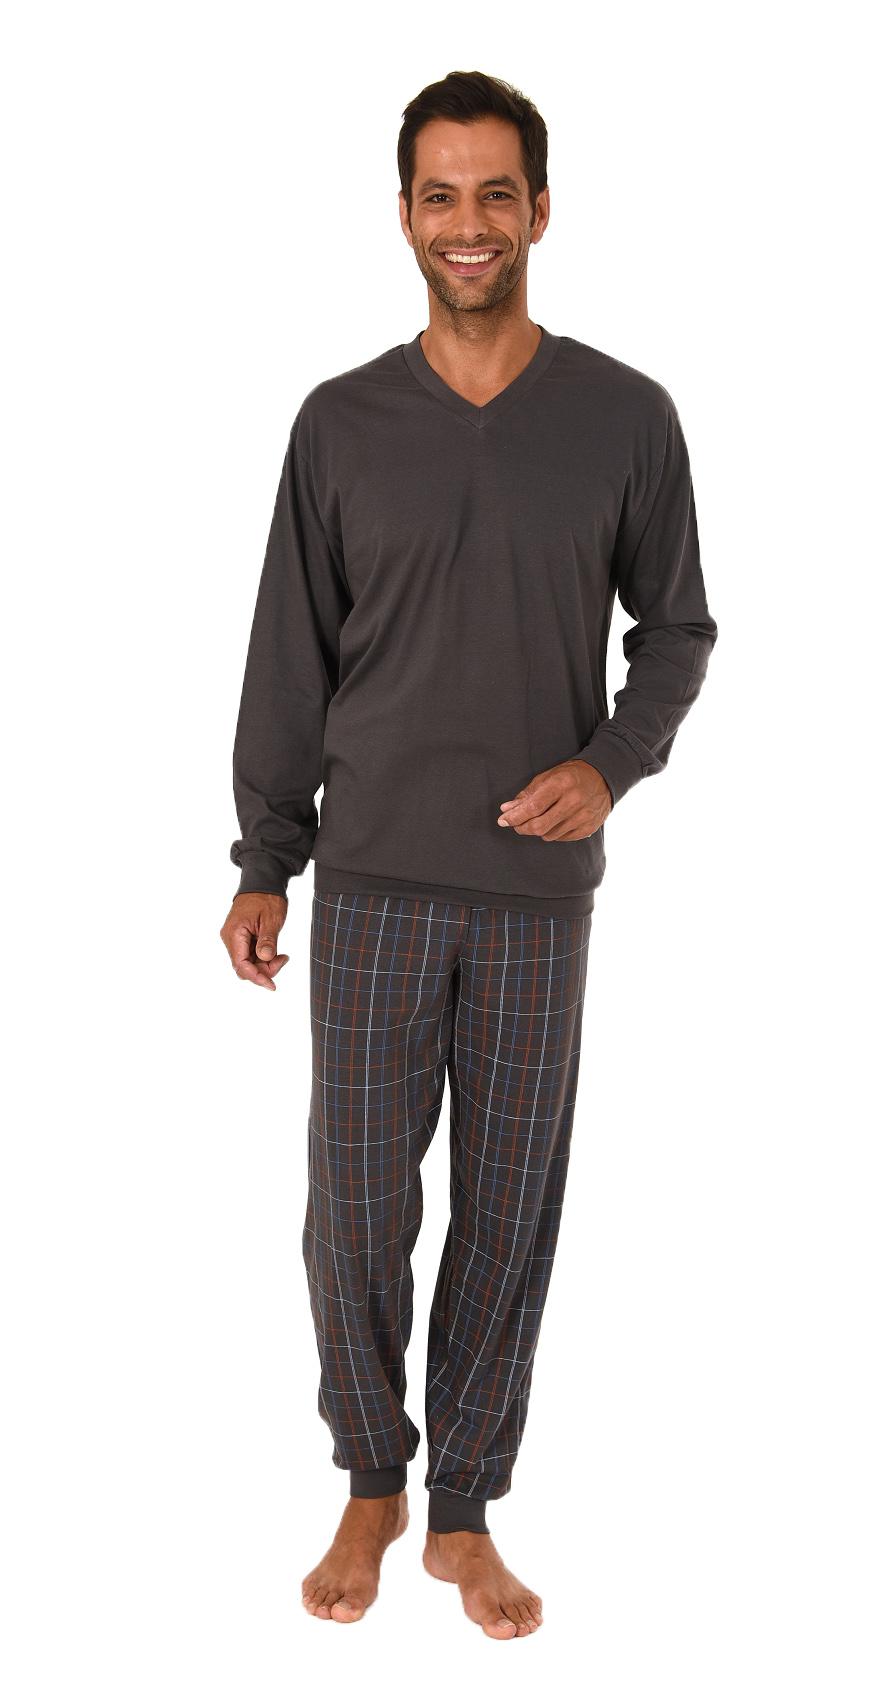 Edler Herren Pyjama, Schlafanzug langarm mit Bündchen - 61949